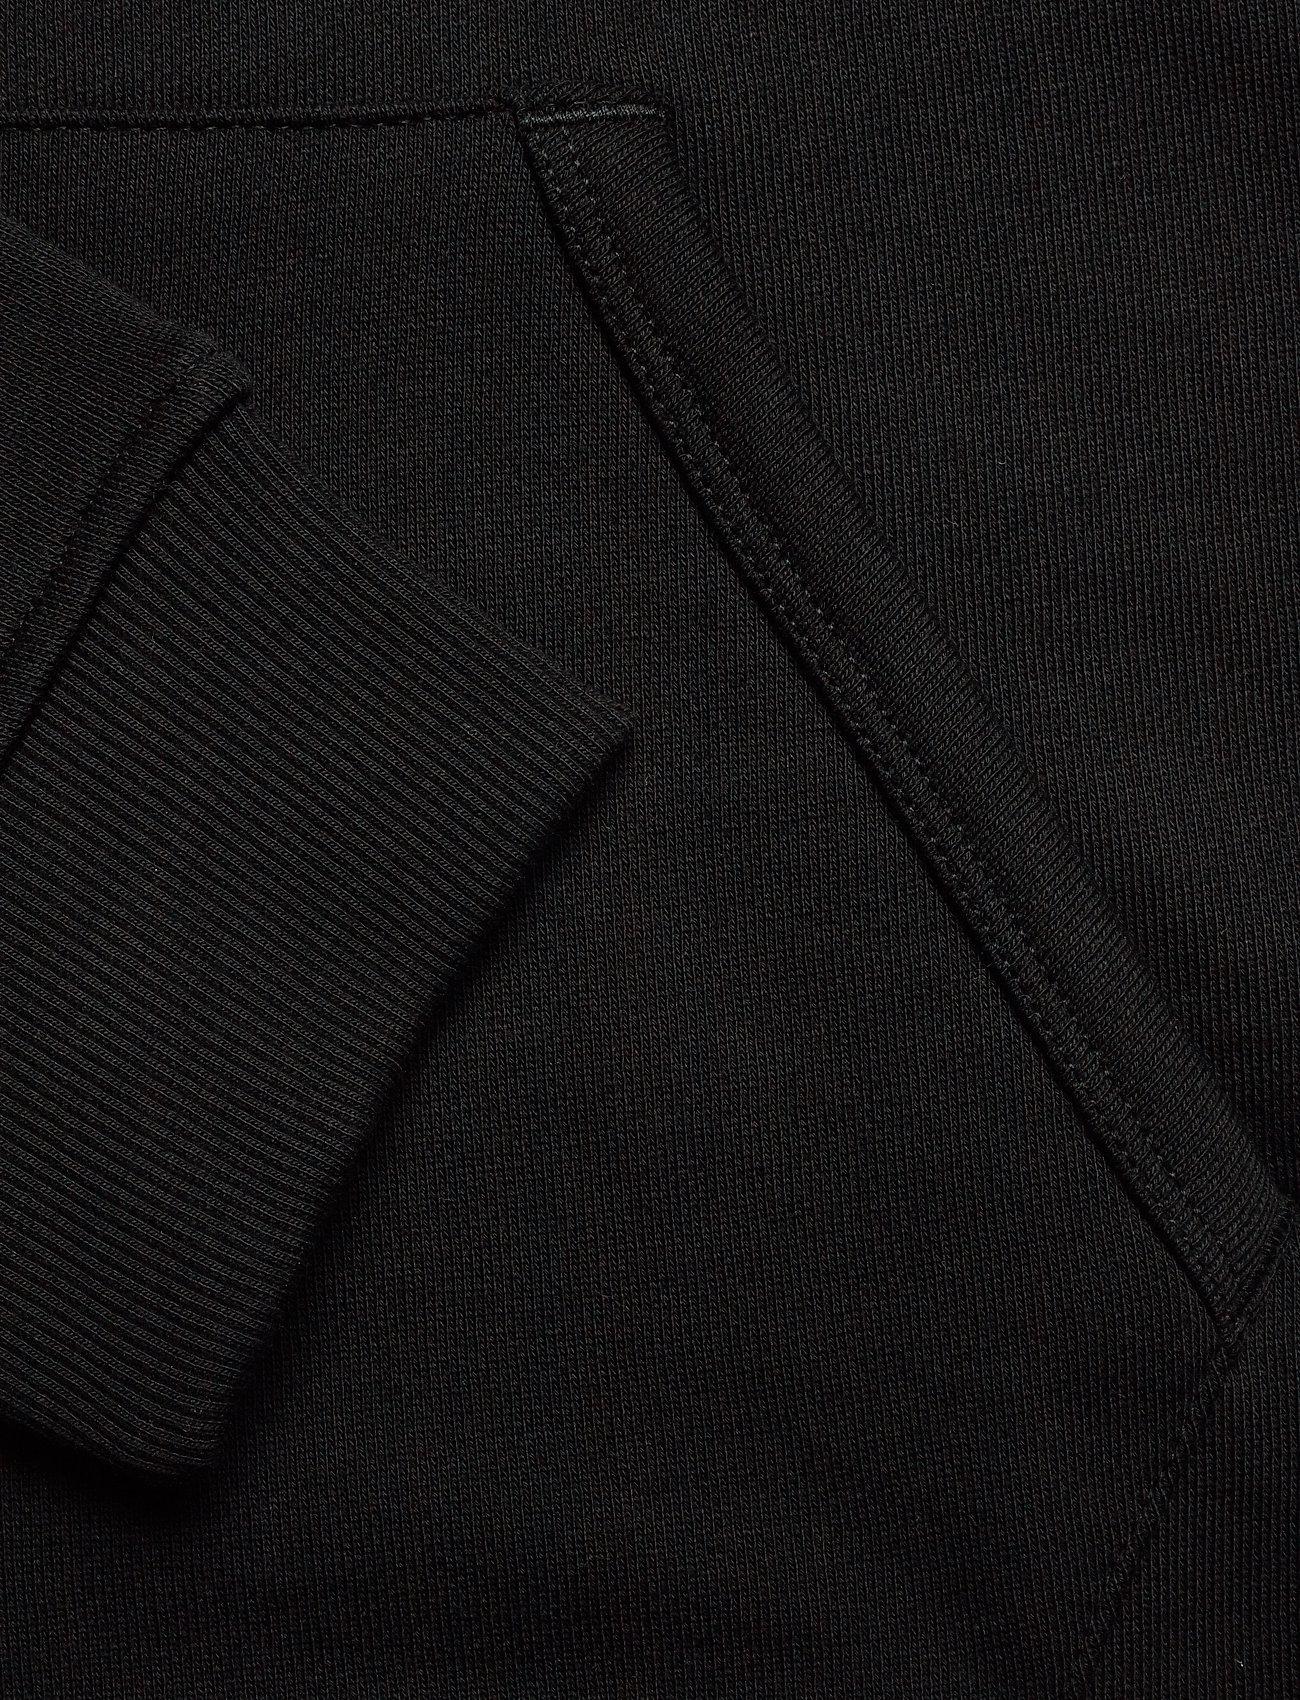 Lyle & Scott Zip Through Hoodie - Sweatshirts JET BLACK - Menn Klær